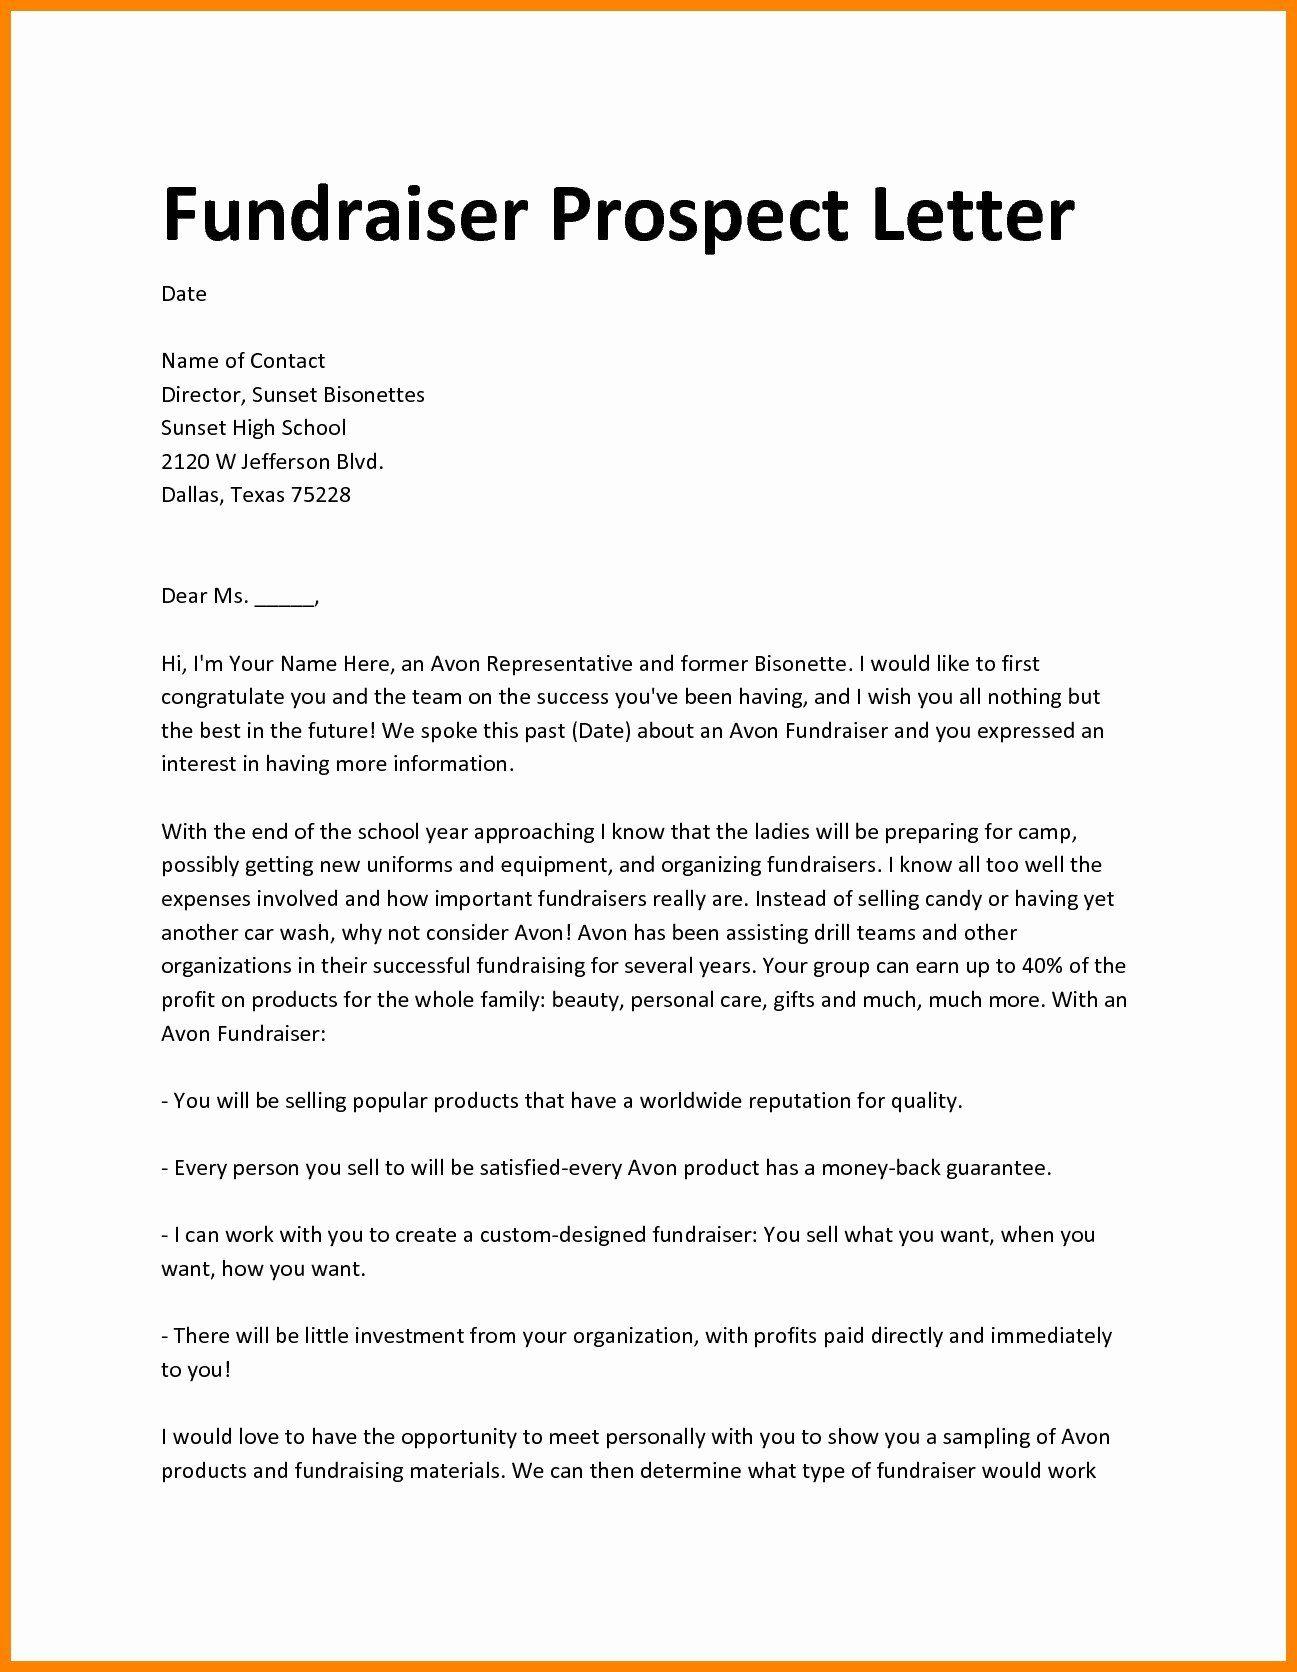 Fund raising letter templates beautiful fundraiser